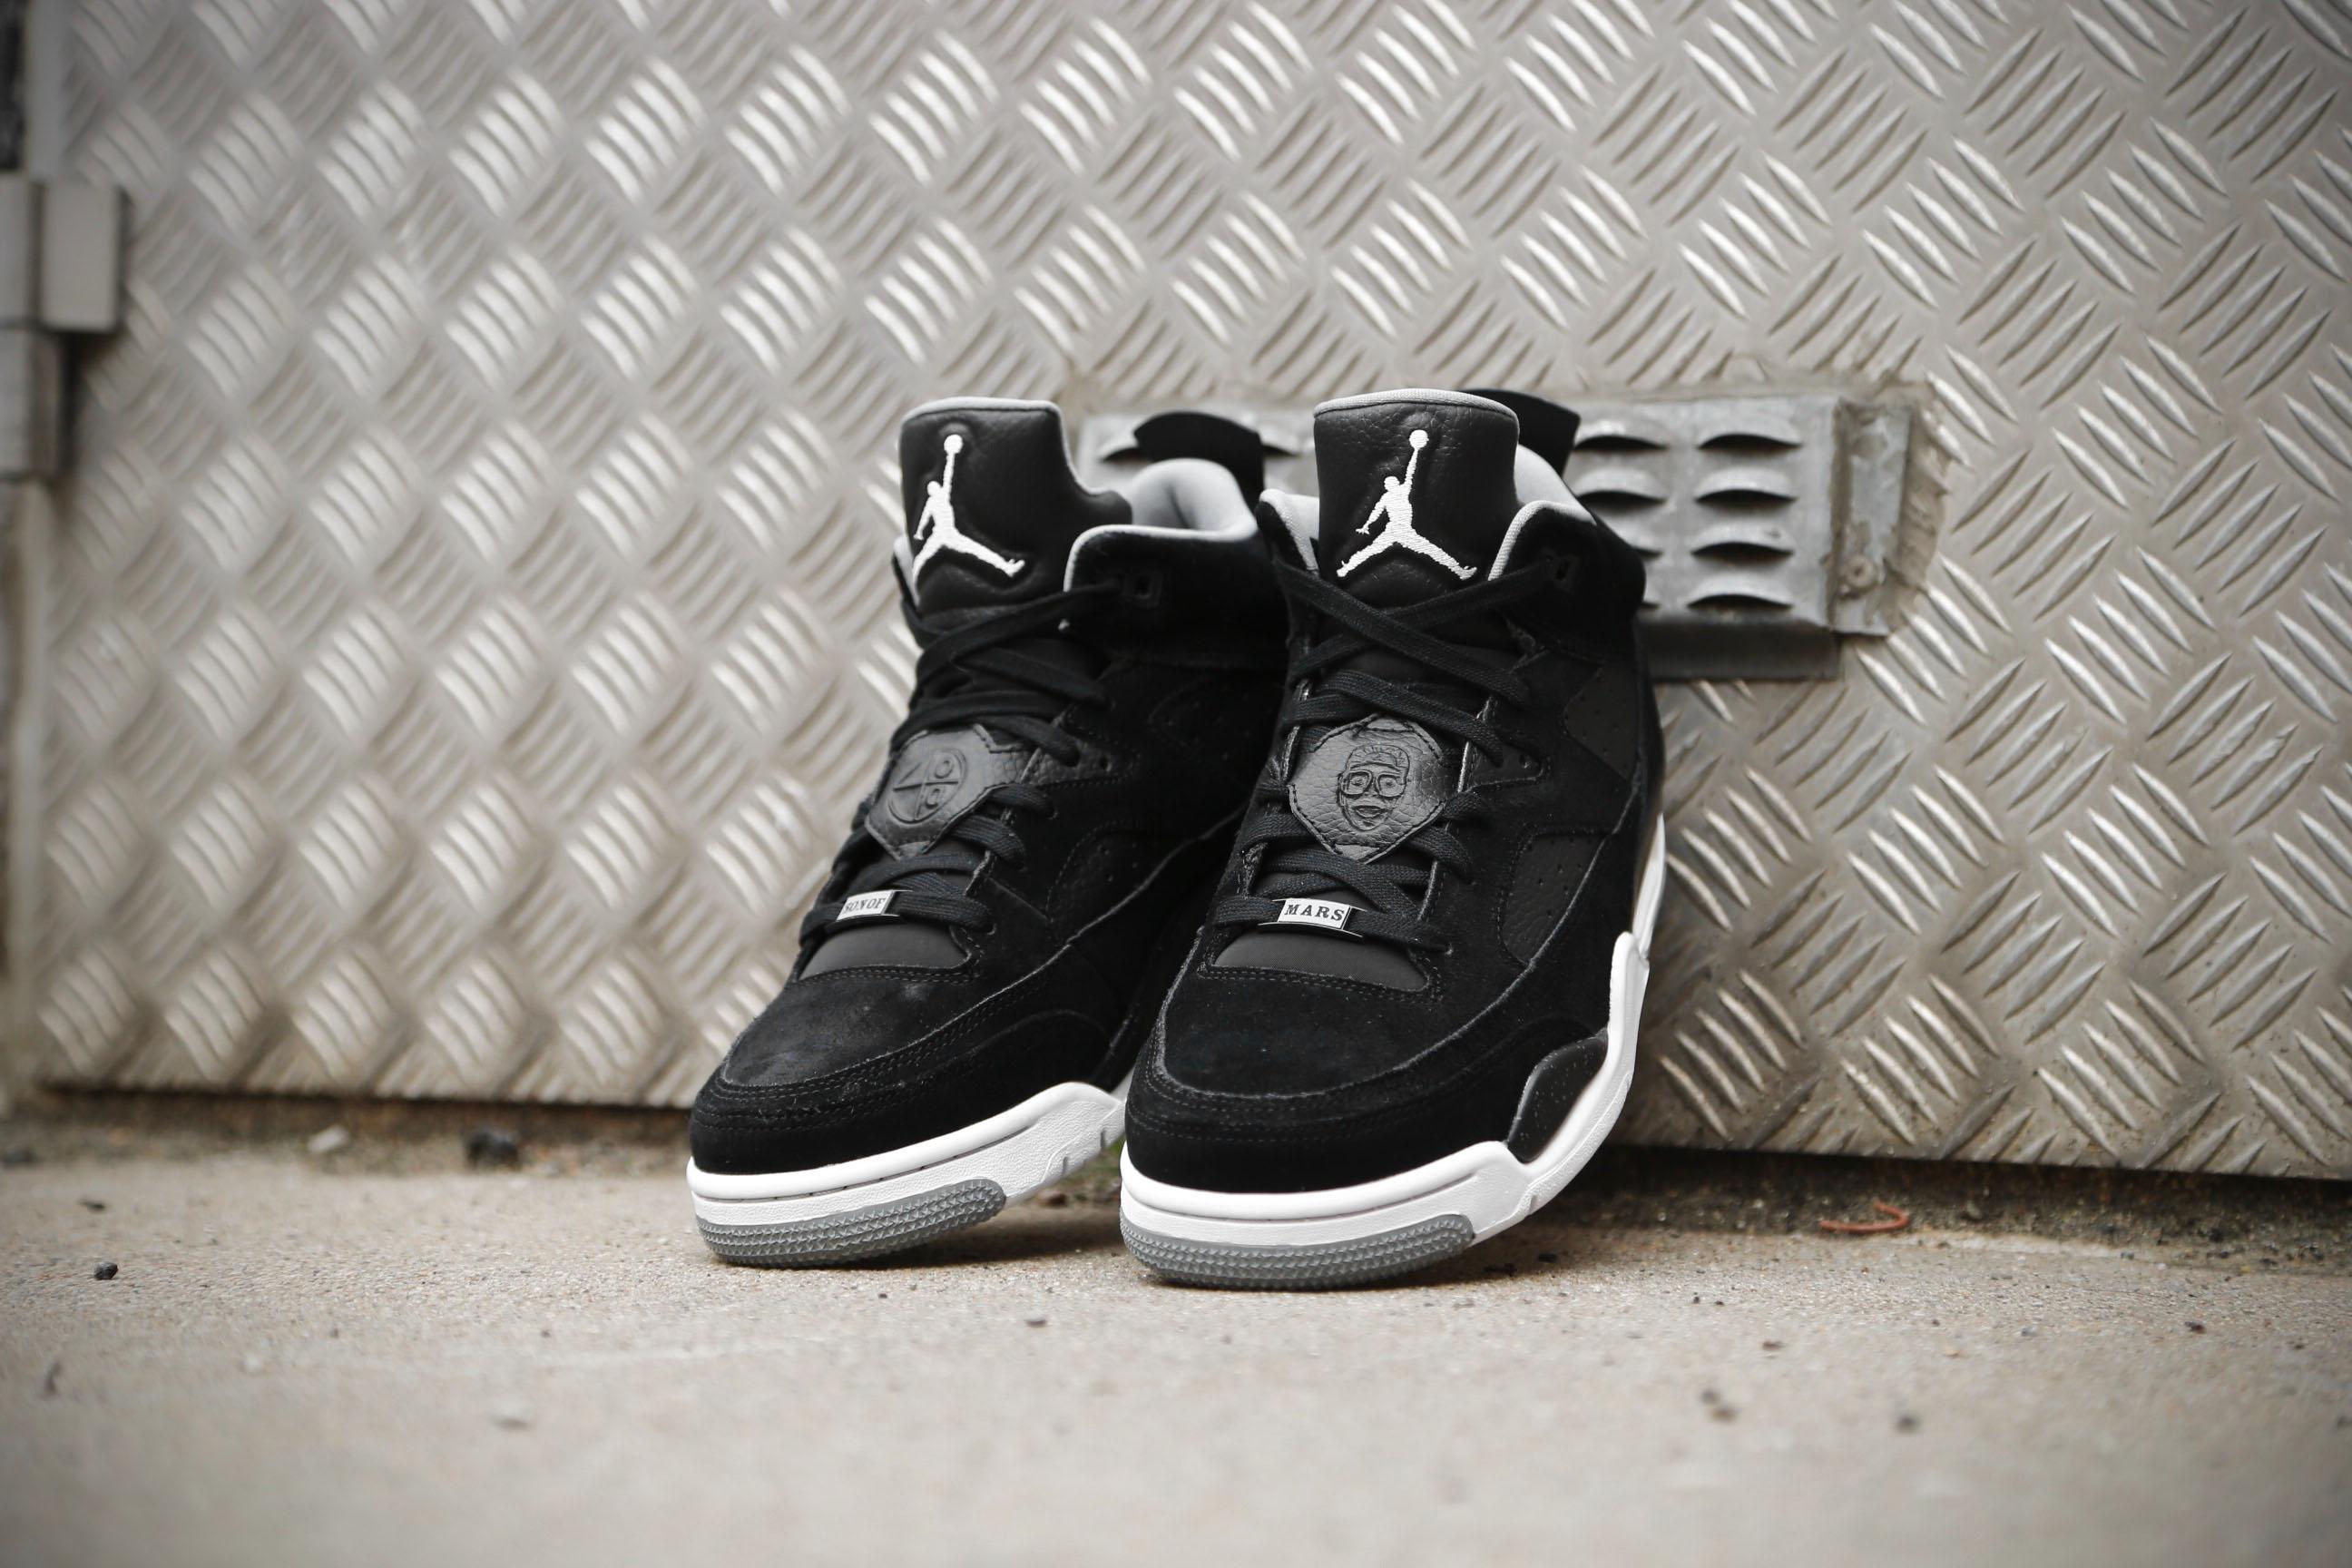 schwarz – Low Mars Of Son Jordan Marke Weiß grau Iron